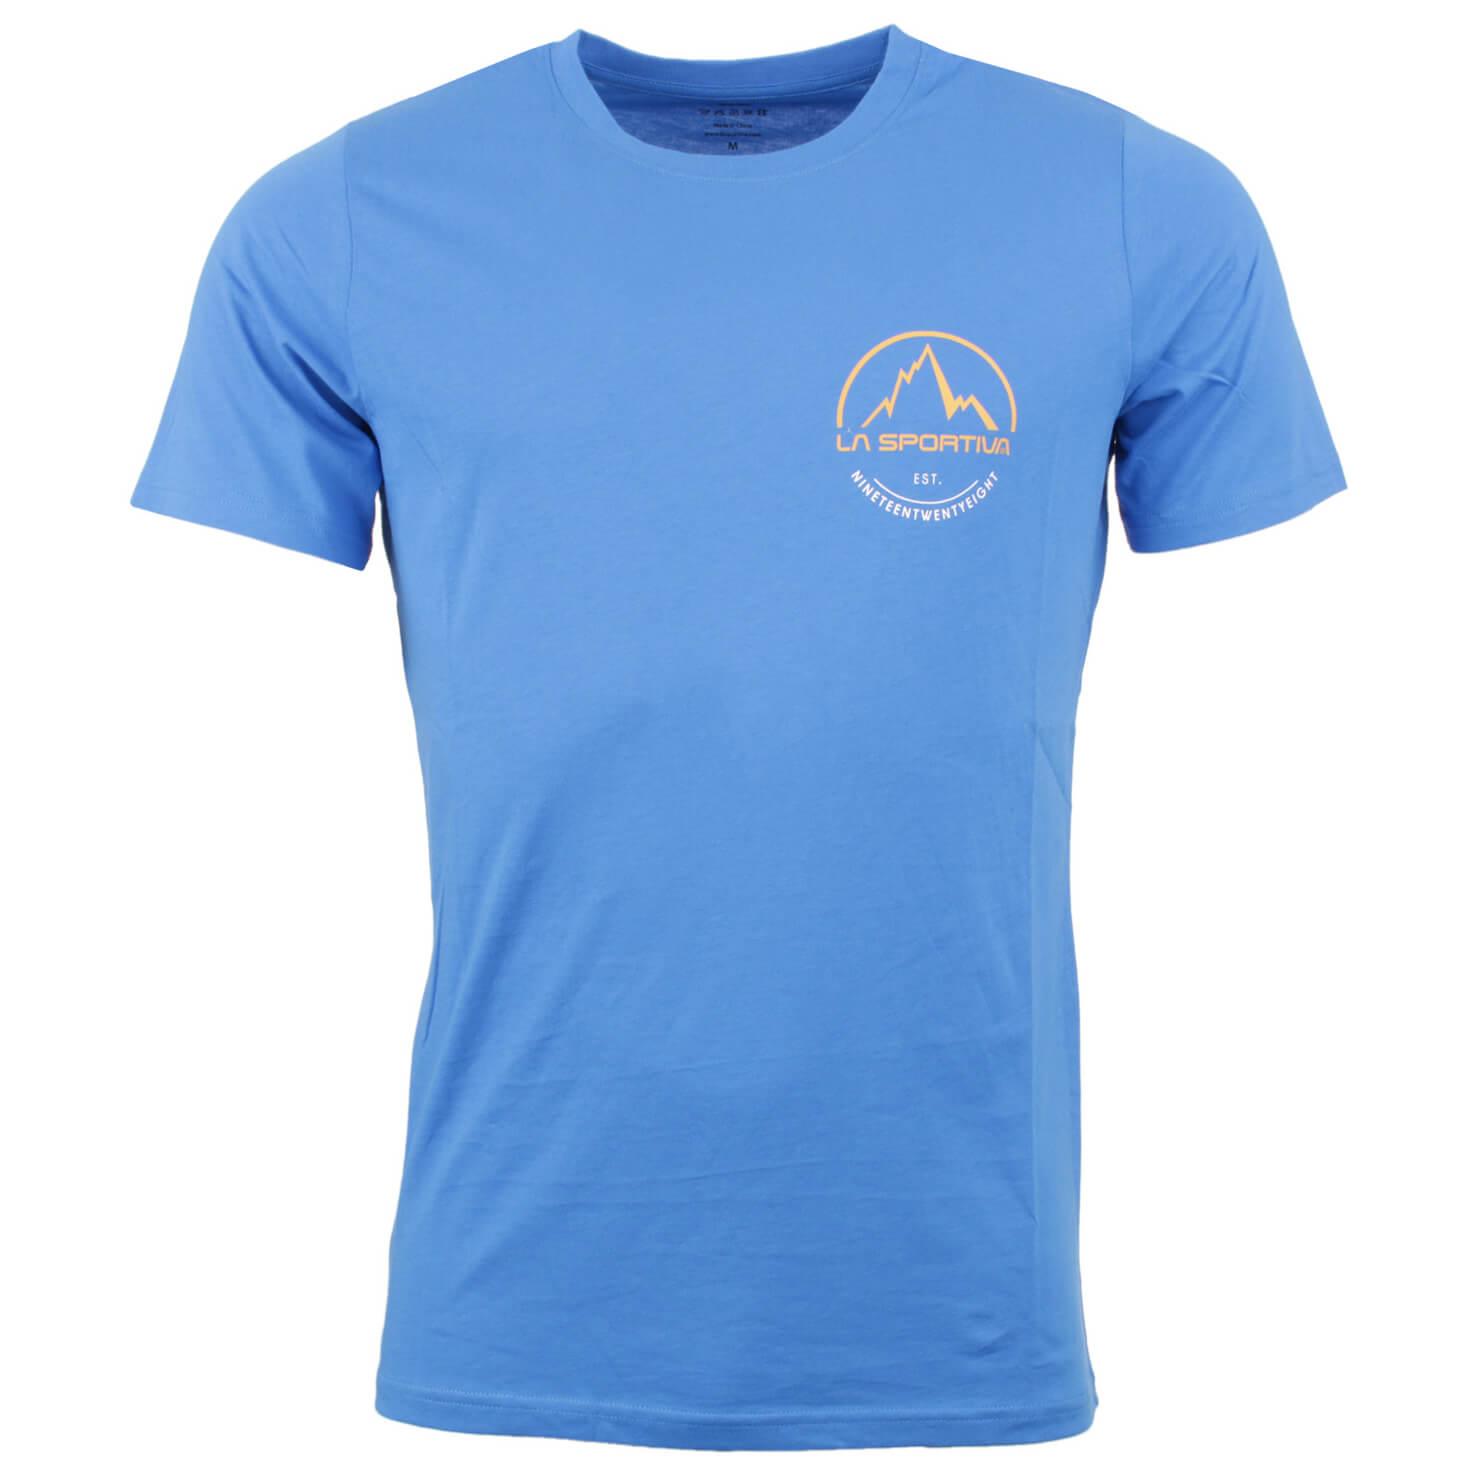 La Sportiva Small Logo Tee T Shirt Men 39 S Buy Online